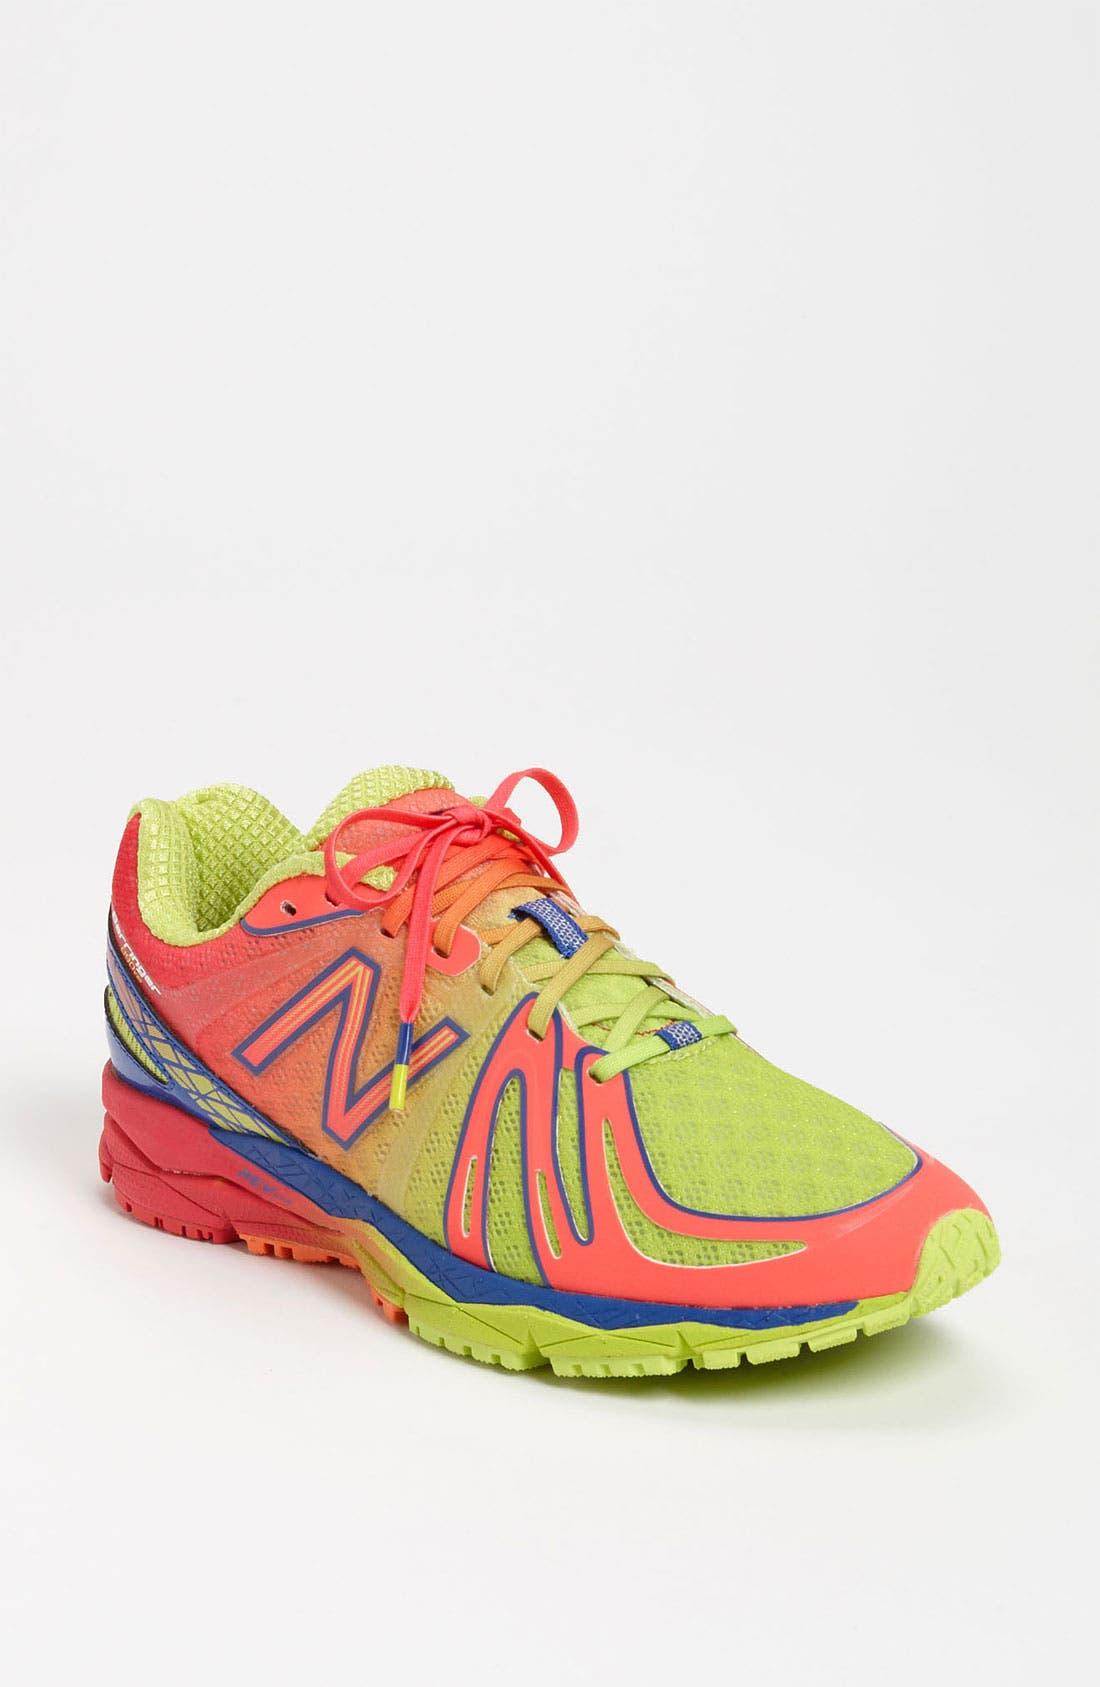 Alternate Image 1 Selected - New Balance '890' Rainbow Running Shoe (Women)